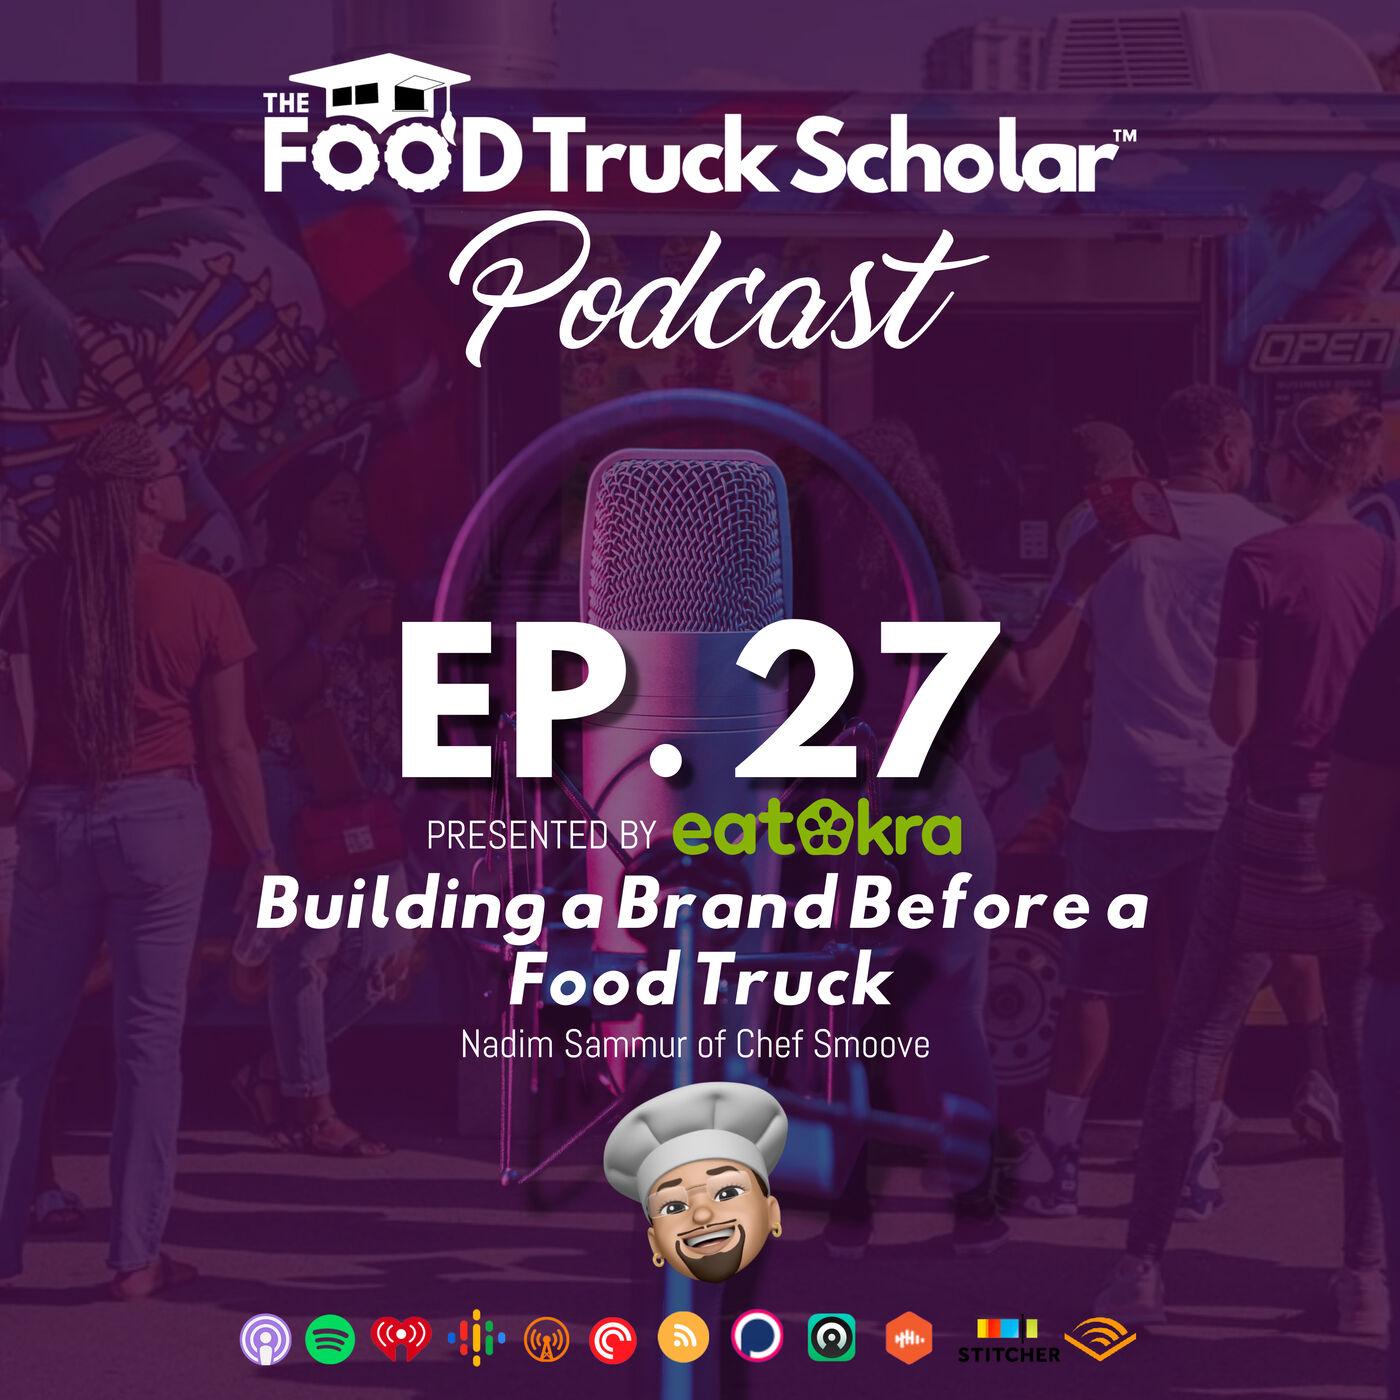 Building a Brand Before a Food Truck w/ Nadim Sammur of Chef Smoove